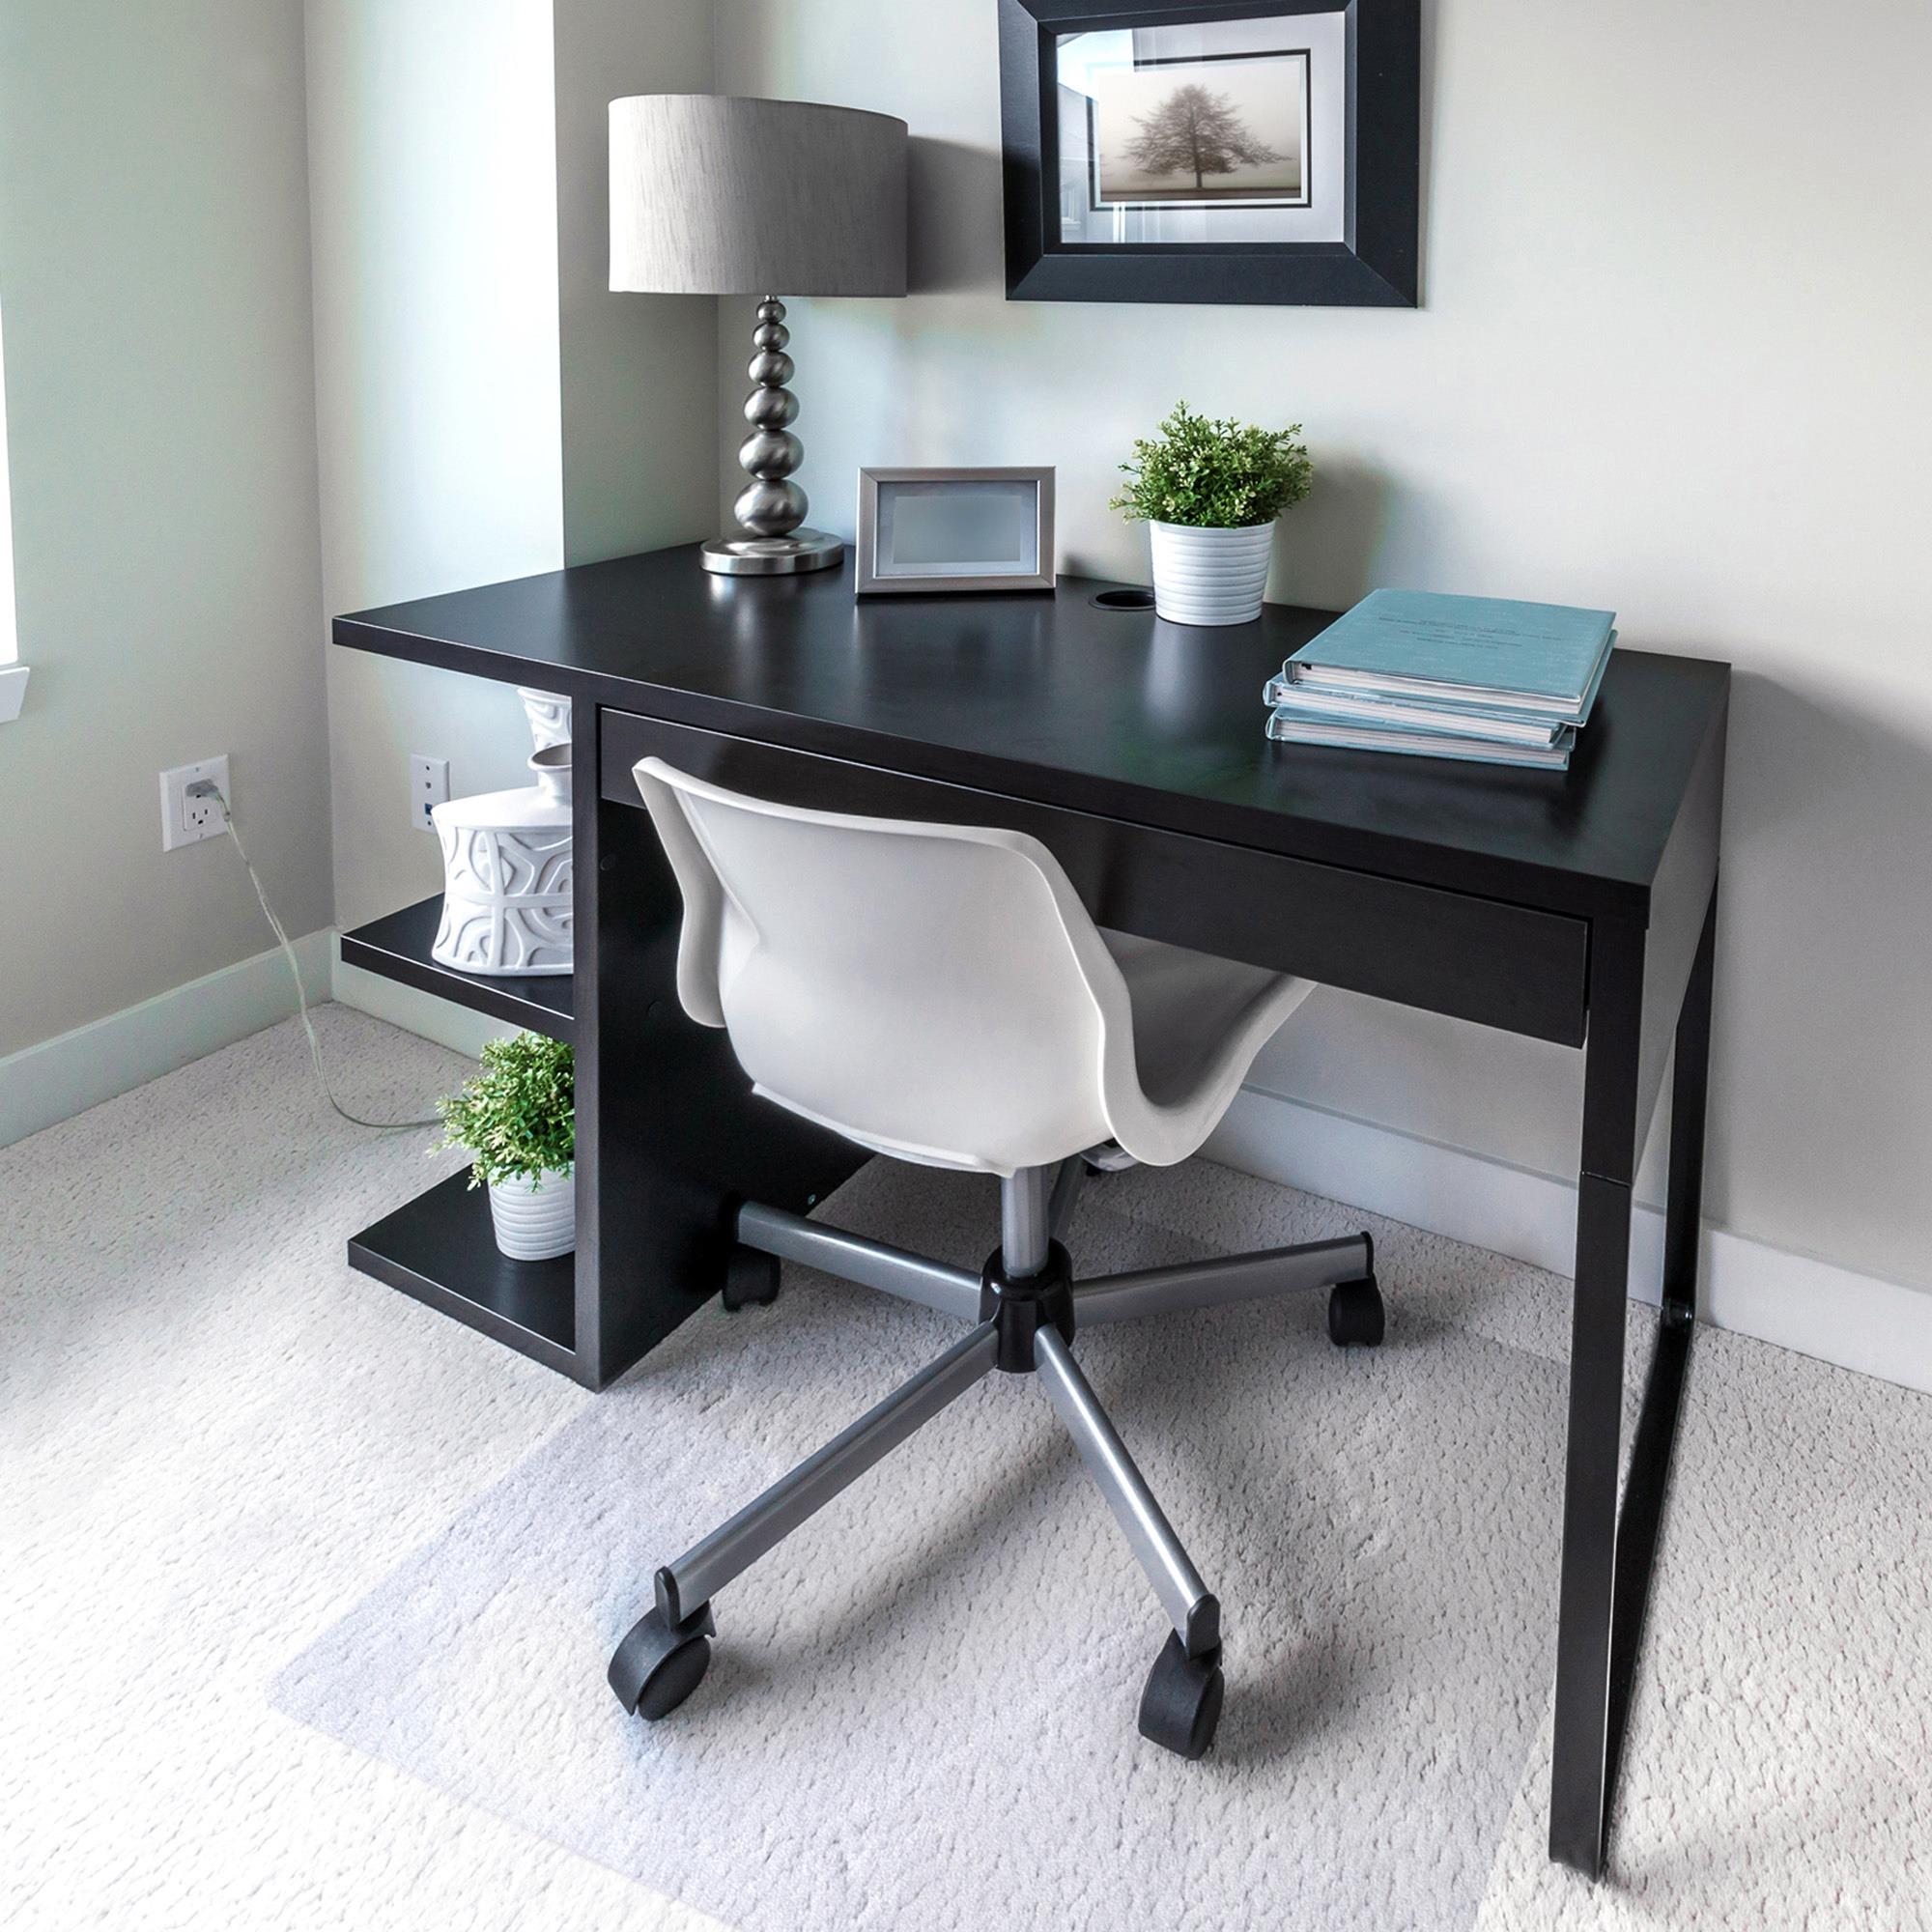 west coast office supplies furniture chairs chair mats